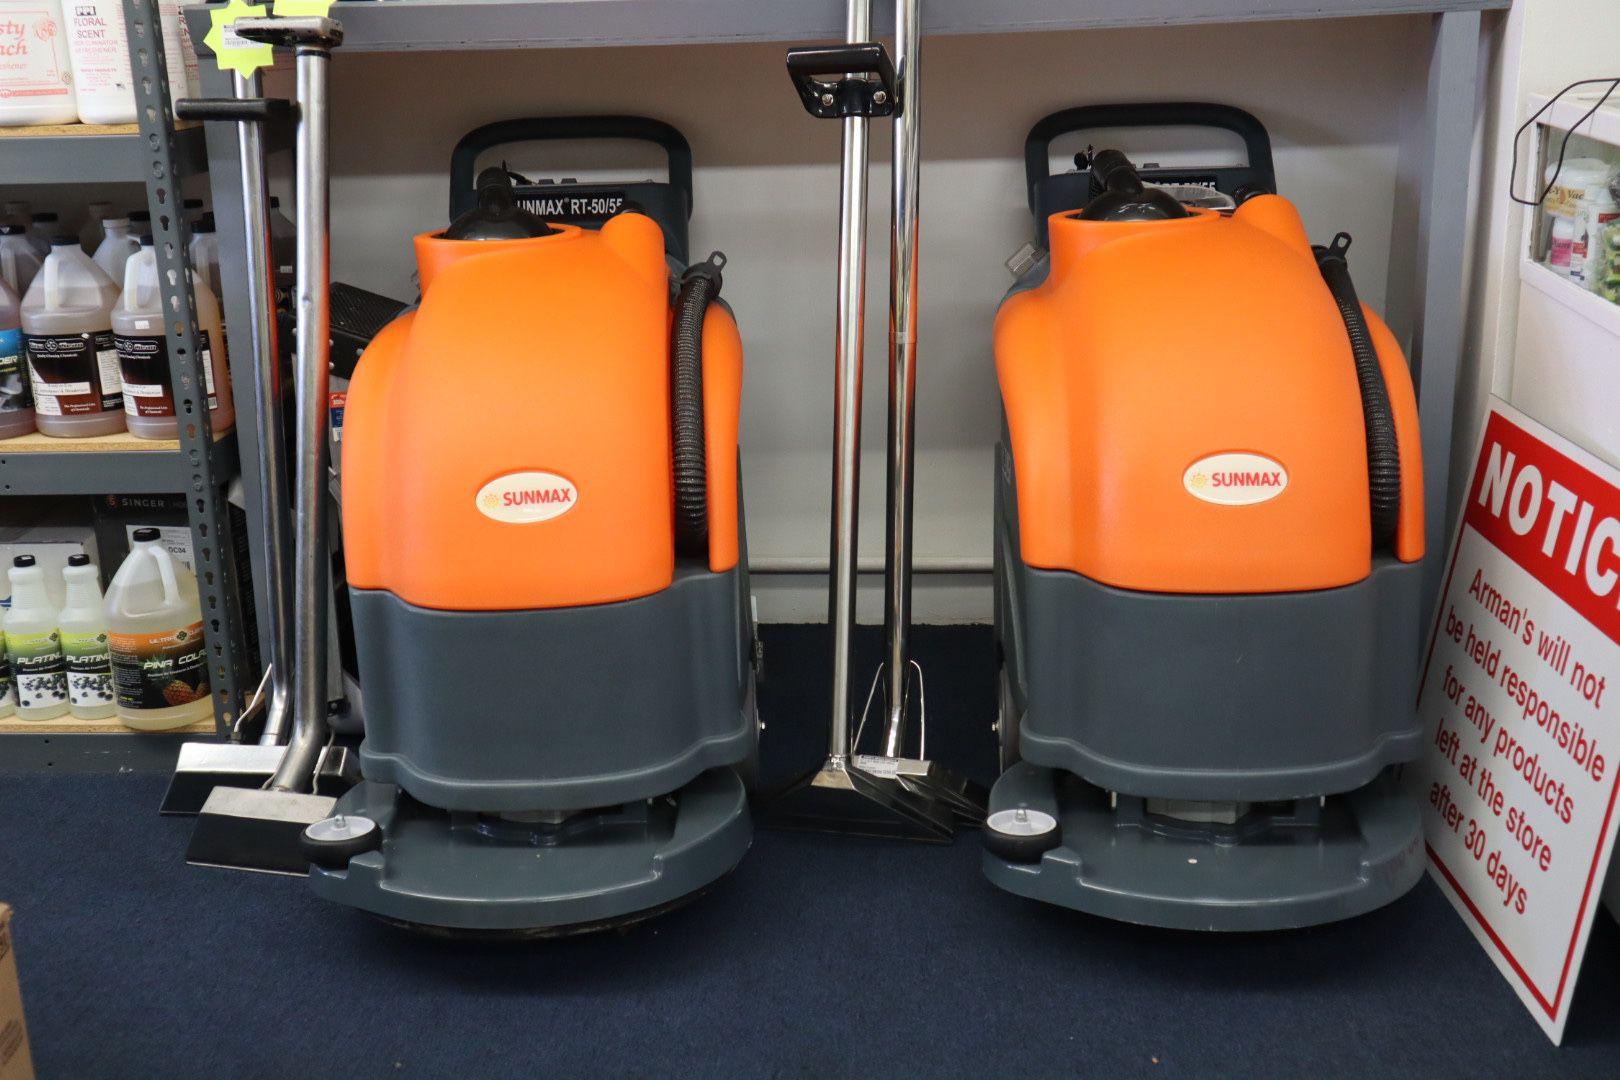 Sunmax 50/55 Battery Powered Floor Scrubber